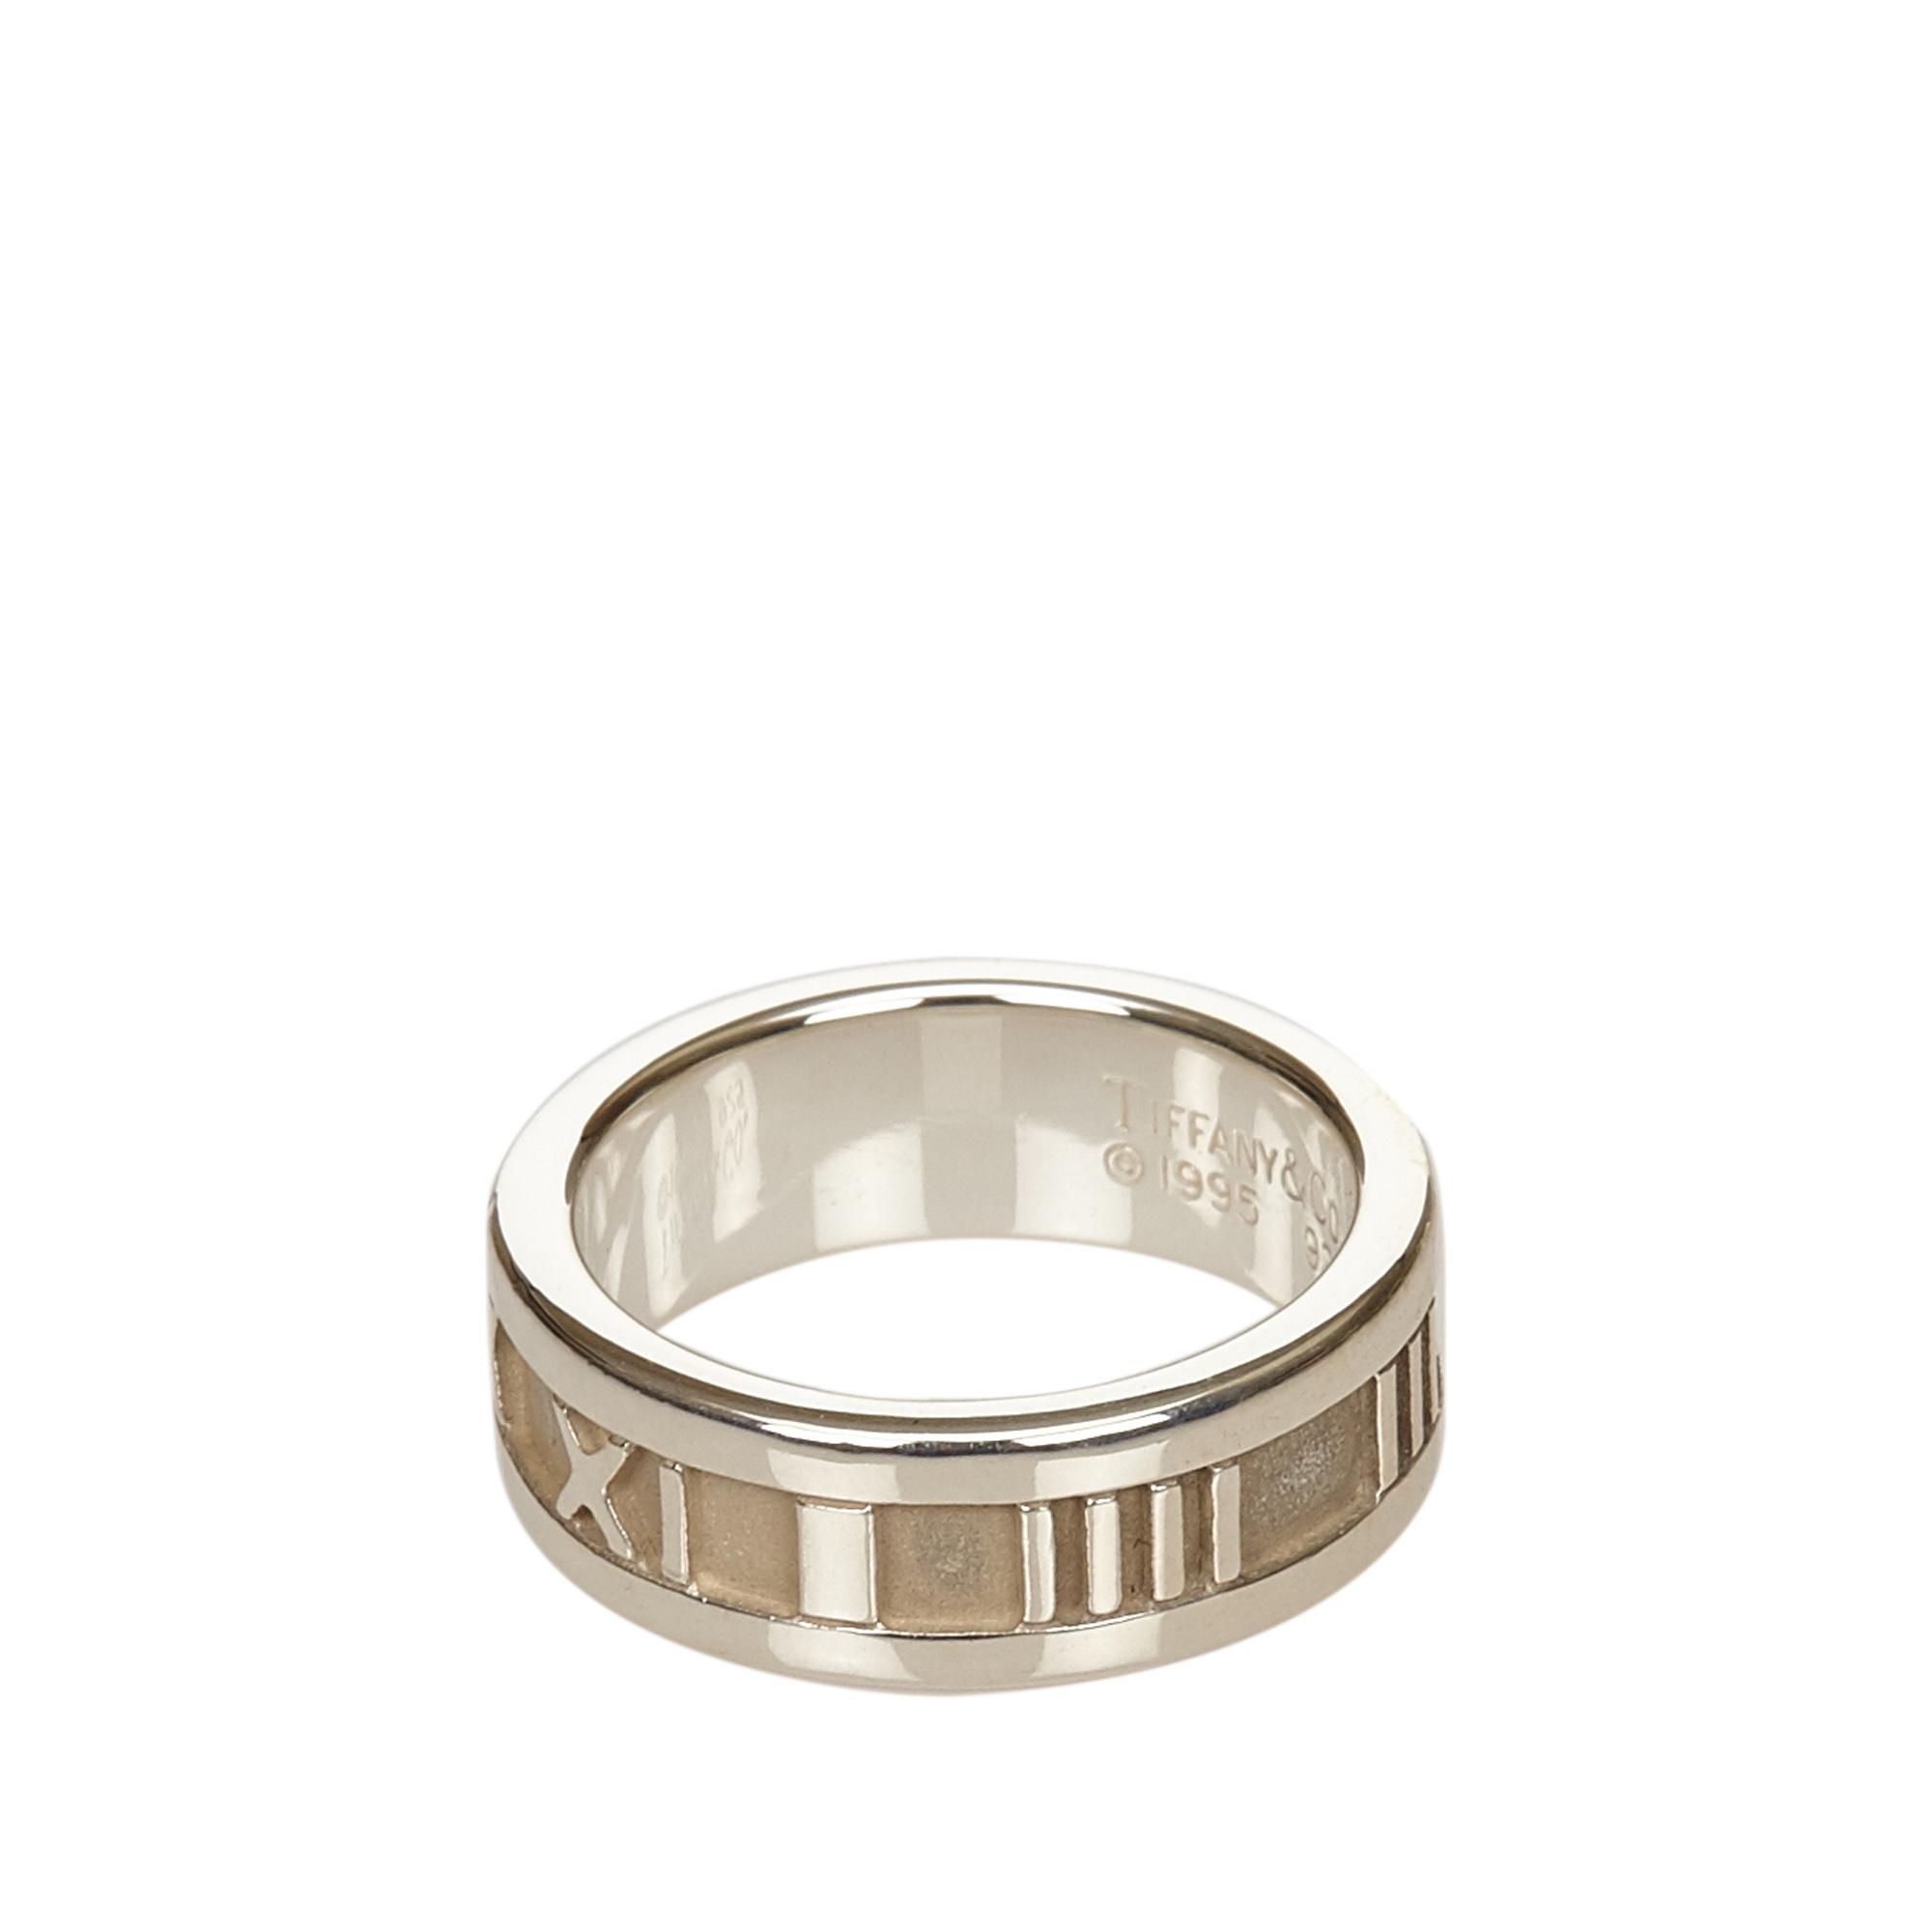 Tiffany & Co. Atlas Silver Ring Size 53